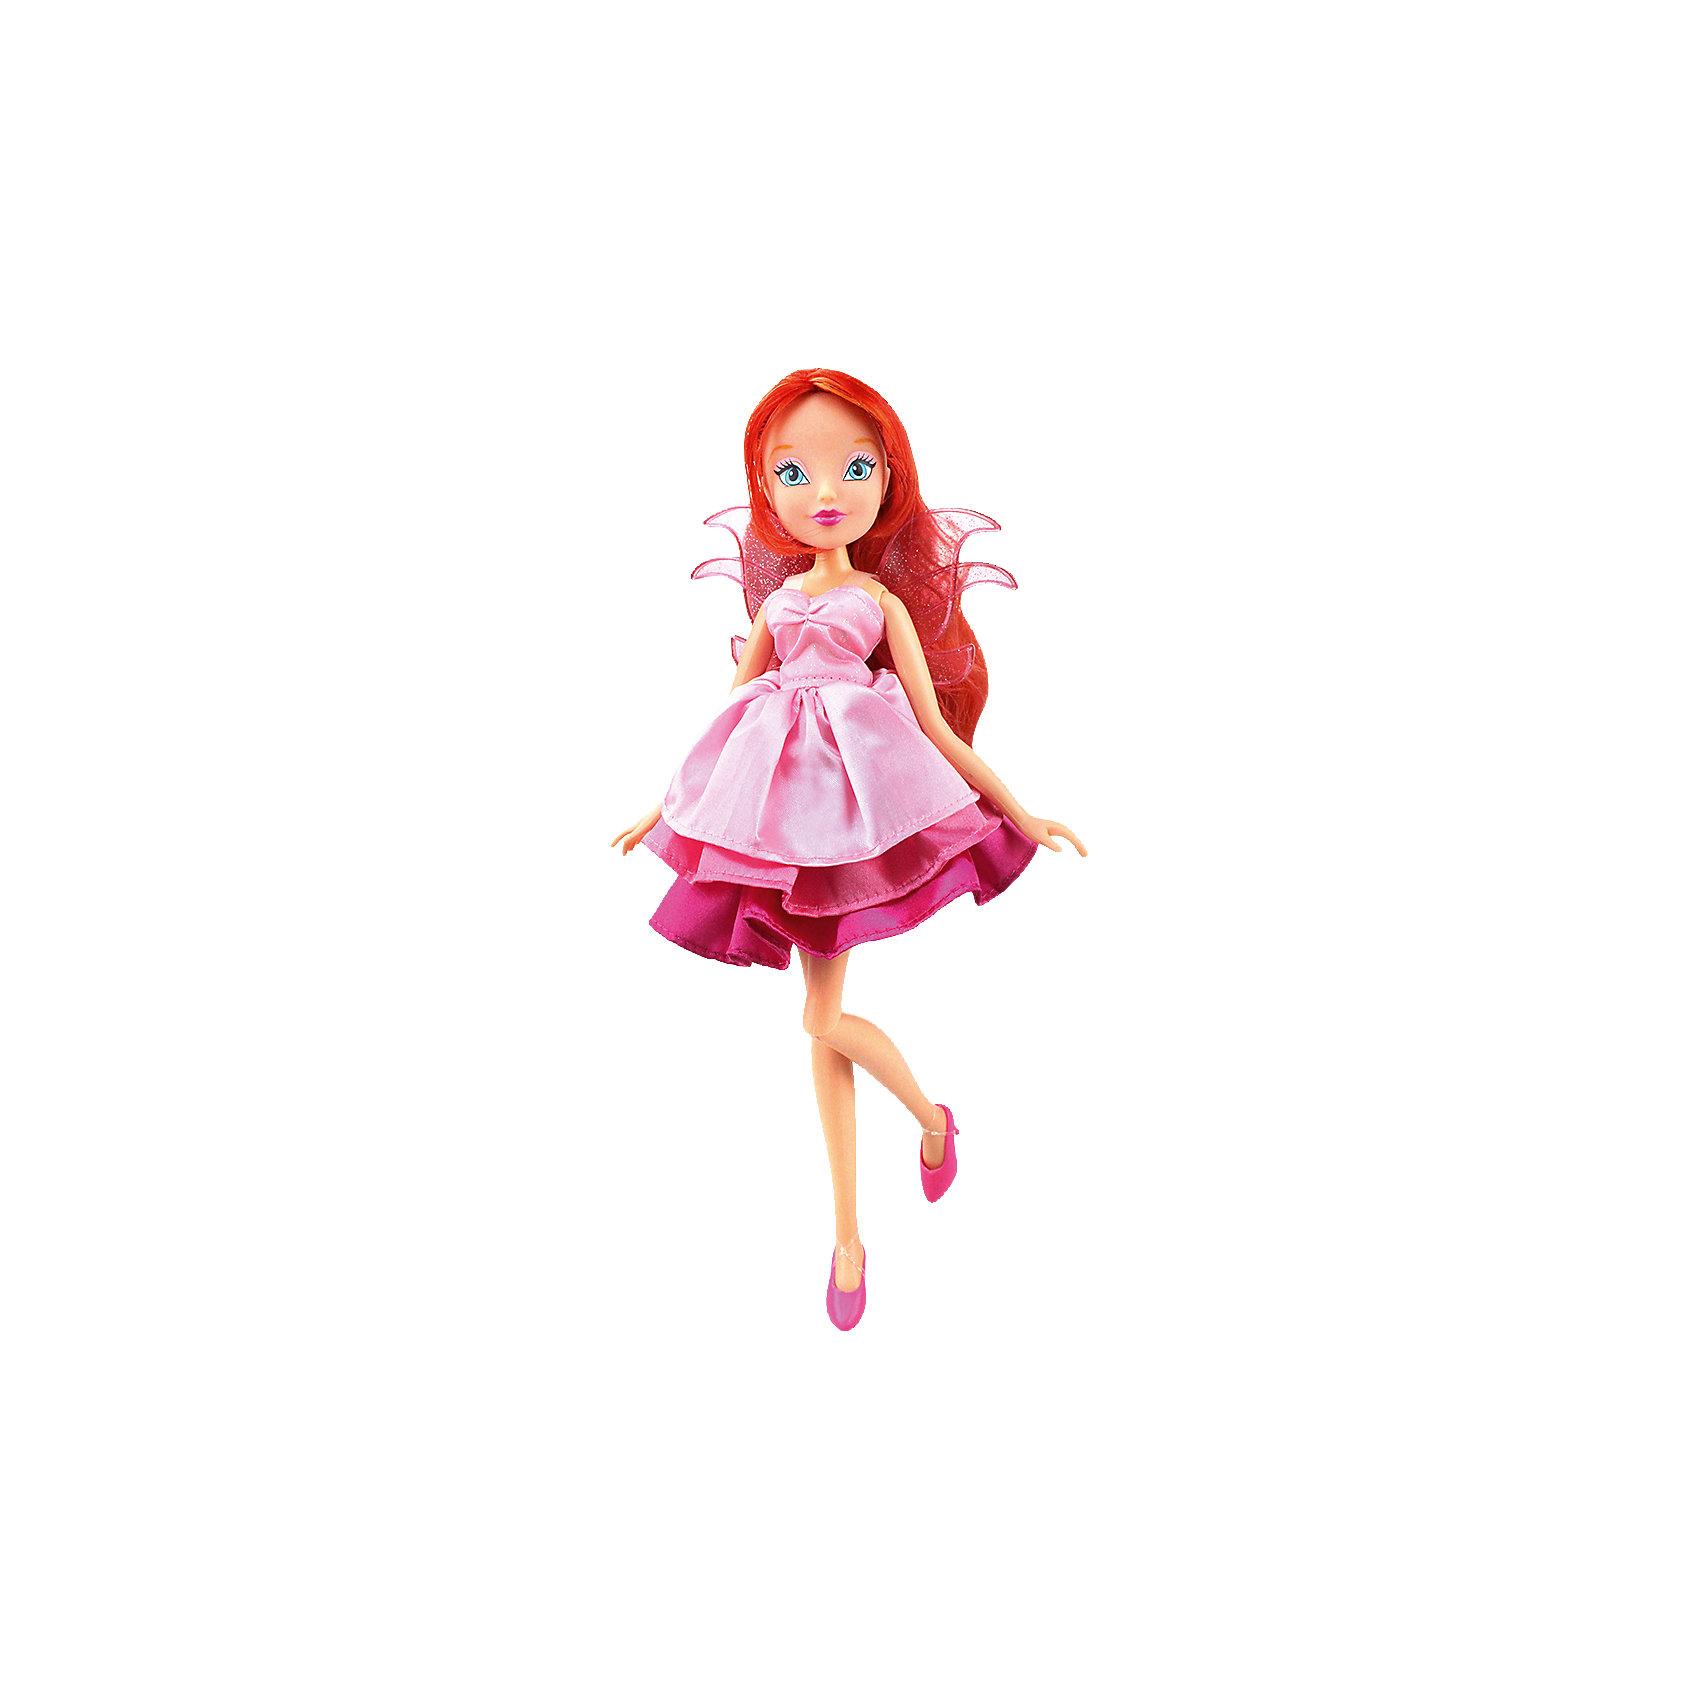 Кукла Блум Волшебное платье, Winx ClubКуклы-модели<br>Doll Winx Club a Magical dress, Bloom<br><br>Ширина мм: 60<br>Глубина мм: 355<br>Высота мм: 210<br>Вес г: 304<br>Возраст от месяцев: 36<br>Возраст до месяцев: 120<br>Пол: Женский<br>Возраст: Детский<br>SKU: 5532625